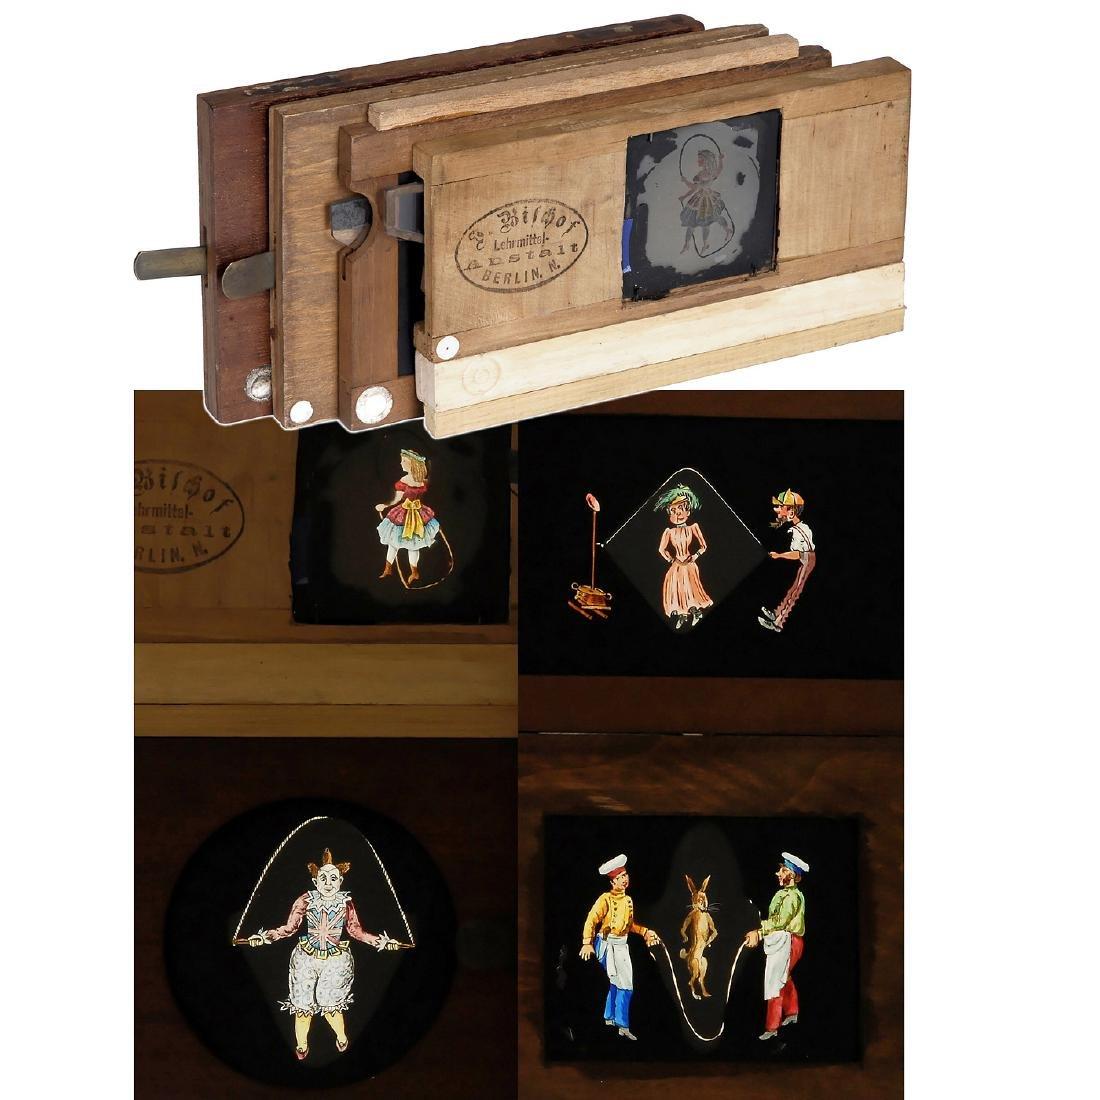 4 Magic Lantern Skipping Slides, c. 1870-80